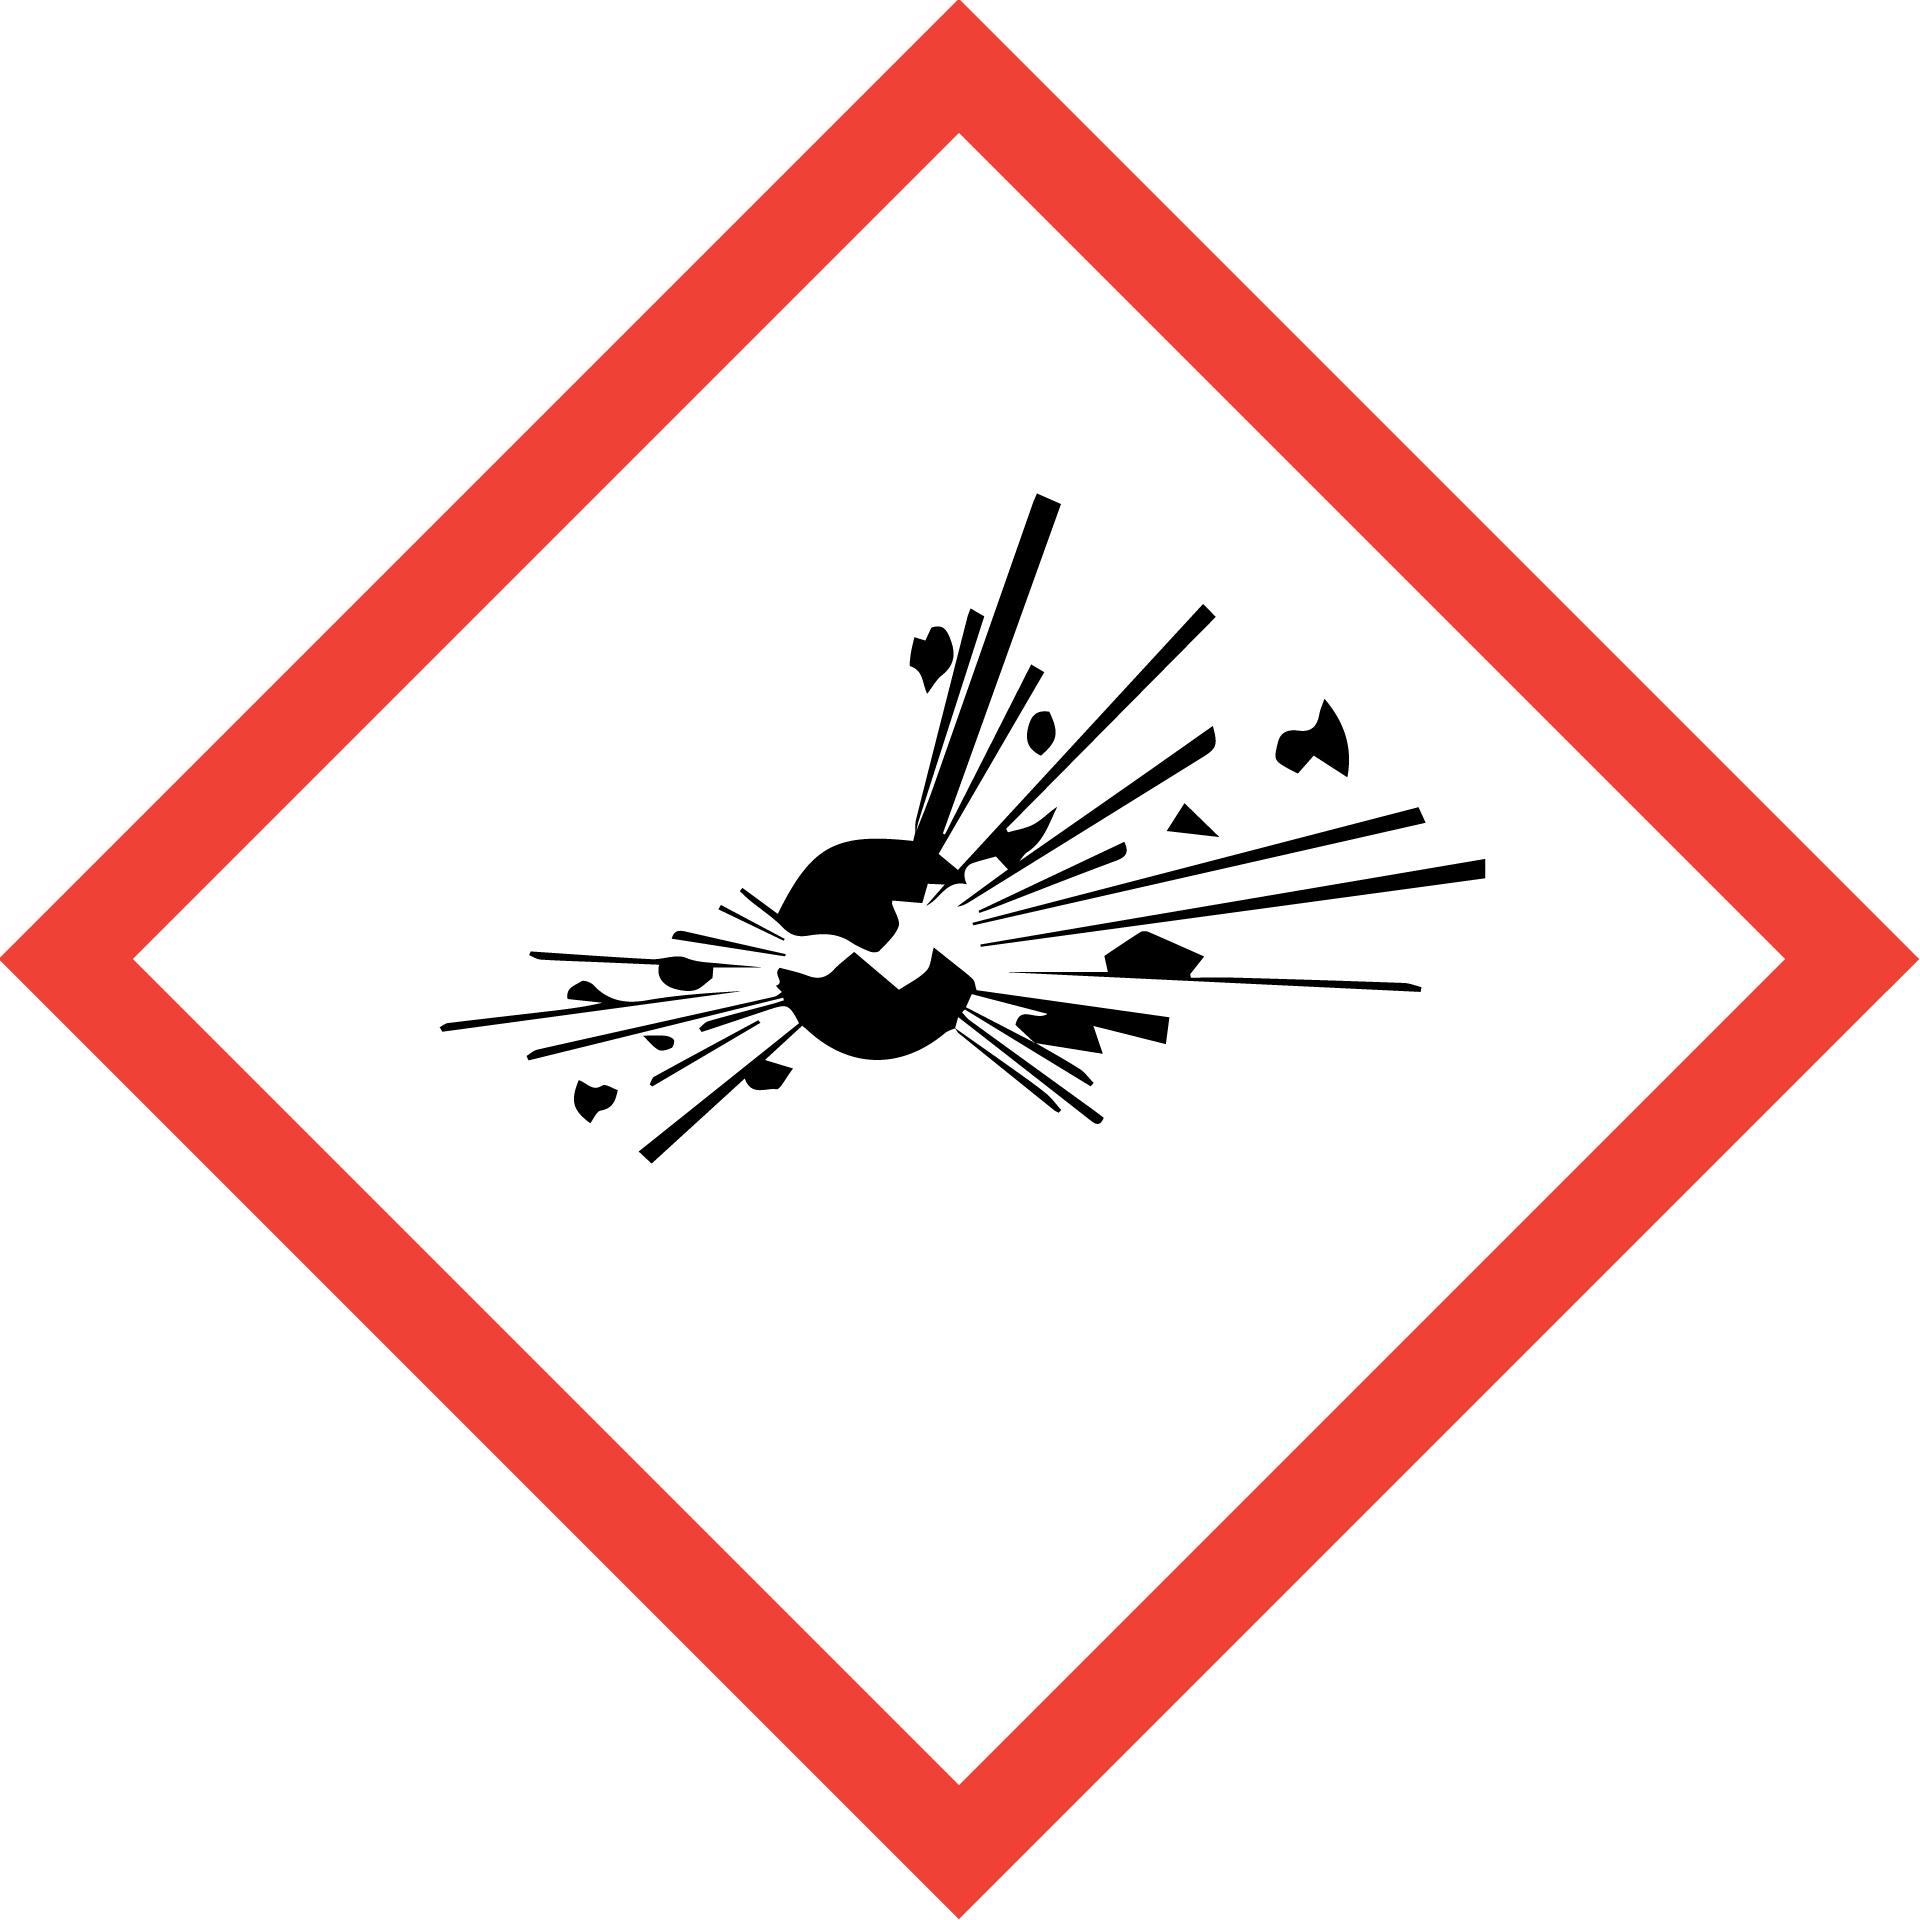 Explosive Symbol Clipart Best